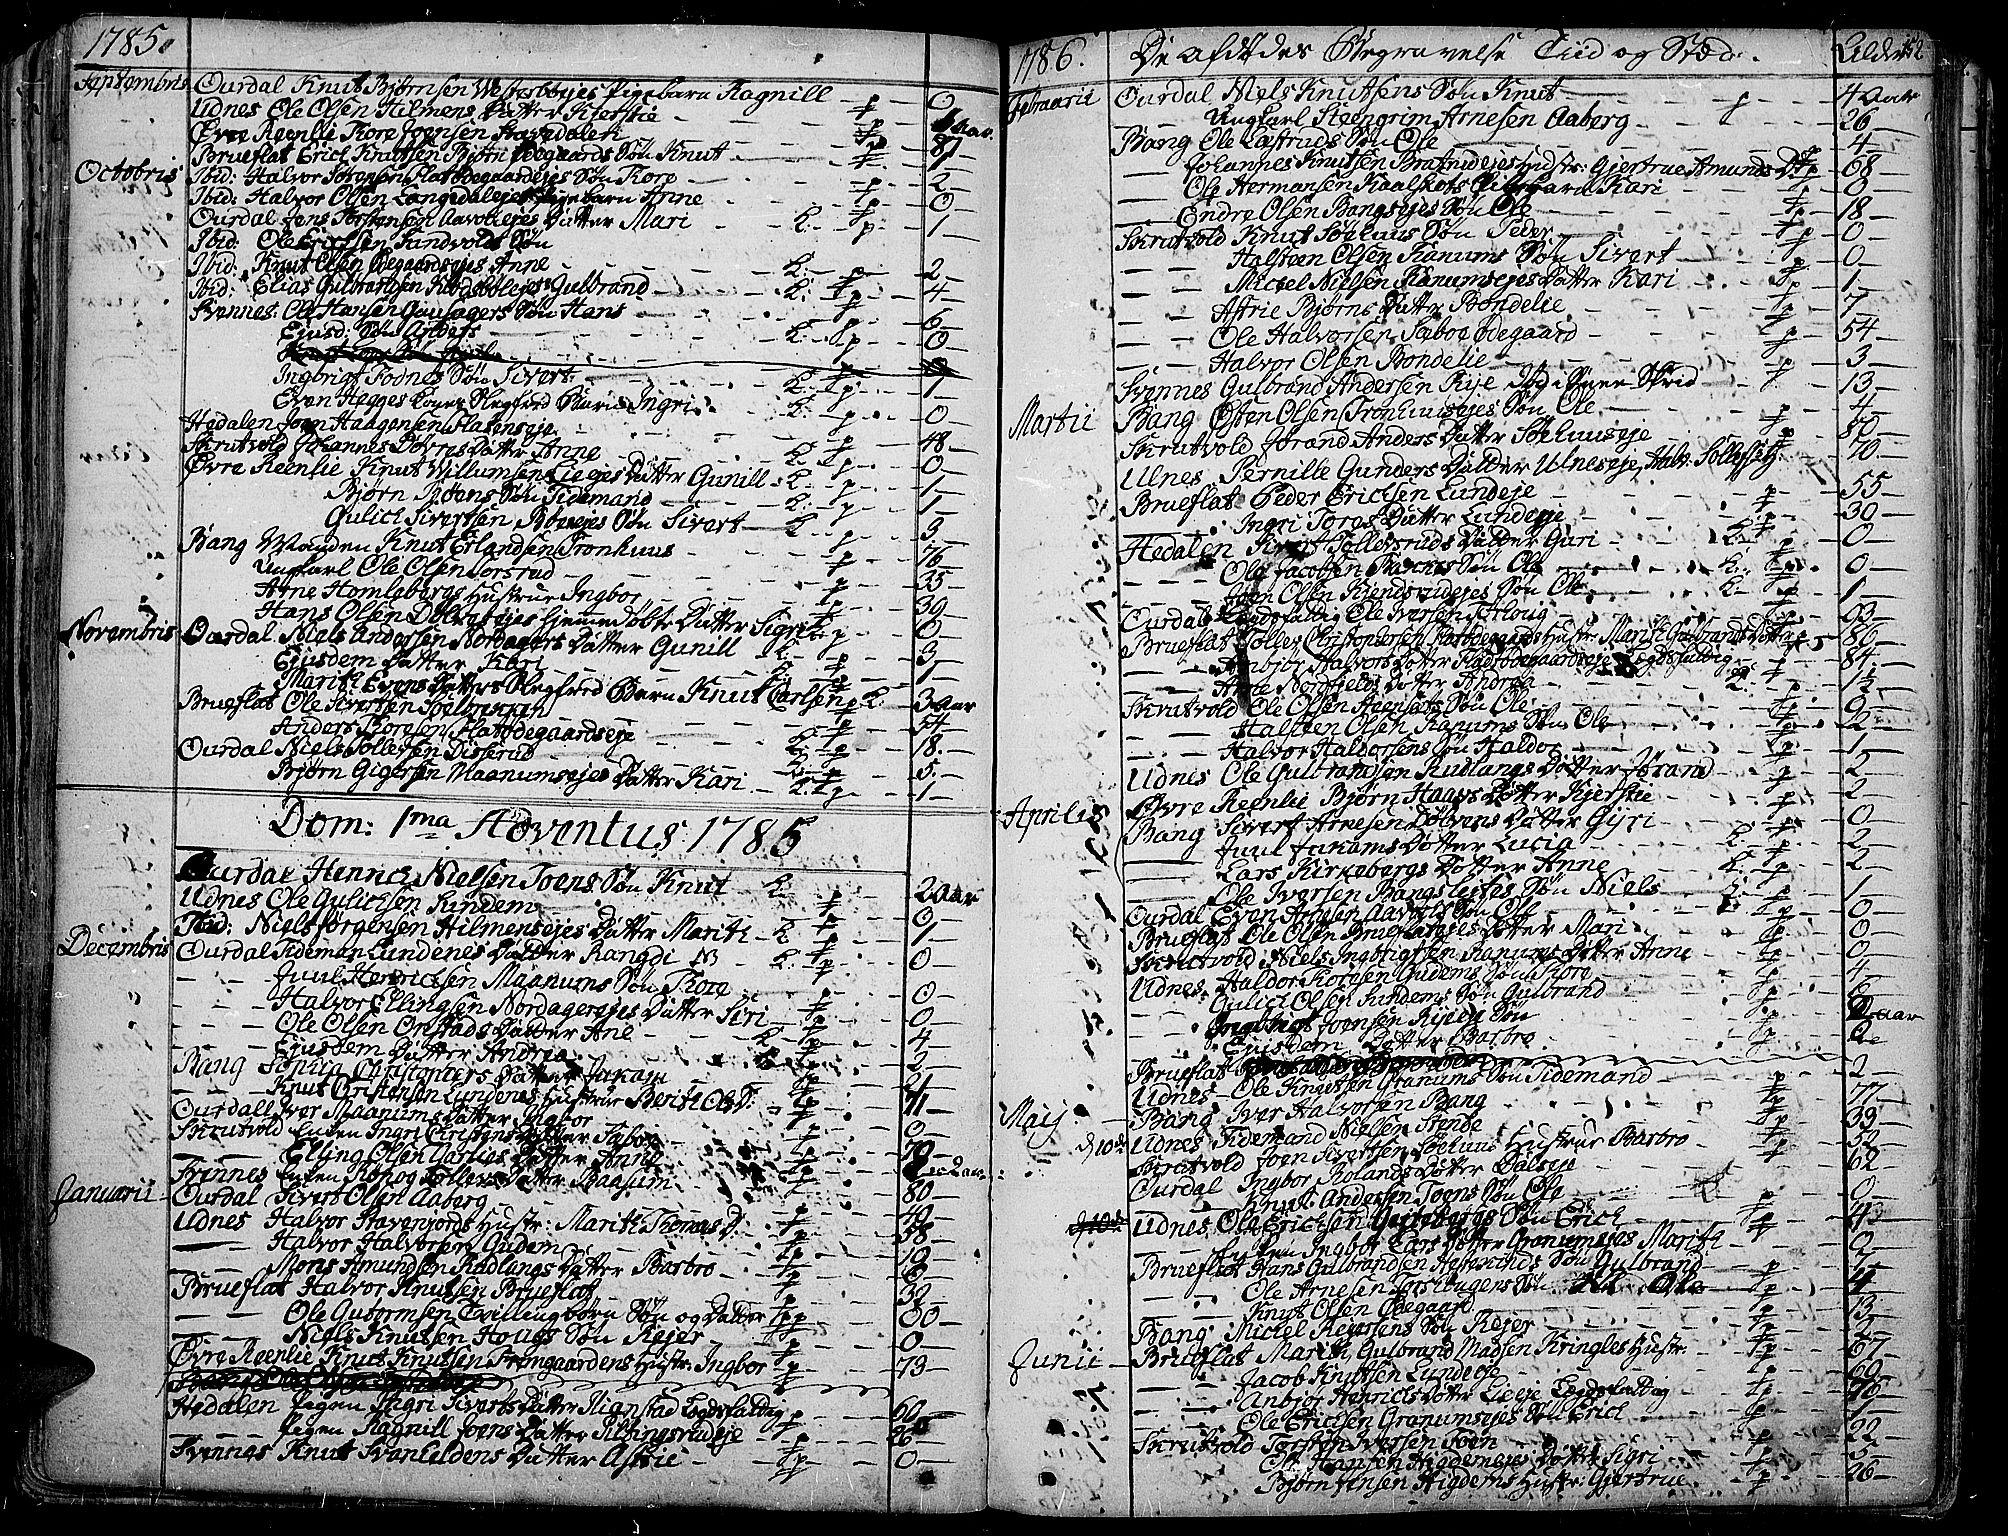 SAH, Aurdal prestekontor, Ministerialbok nr. 6, 1781-1804, s. 152